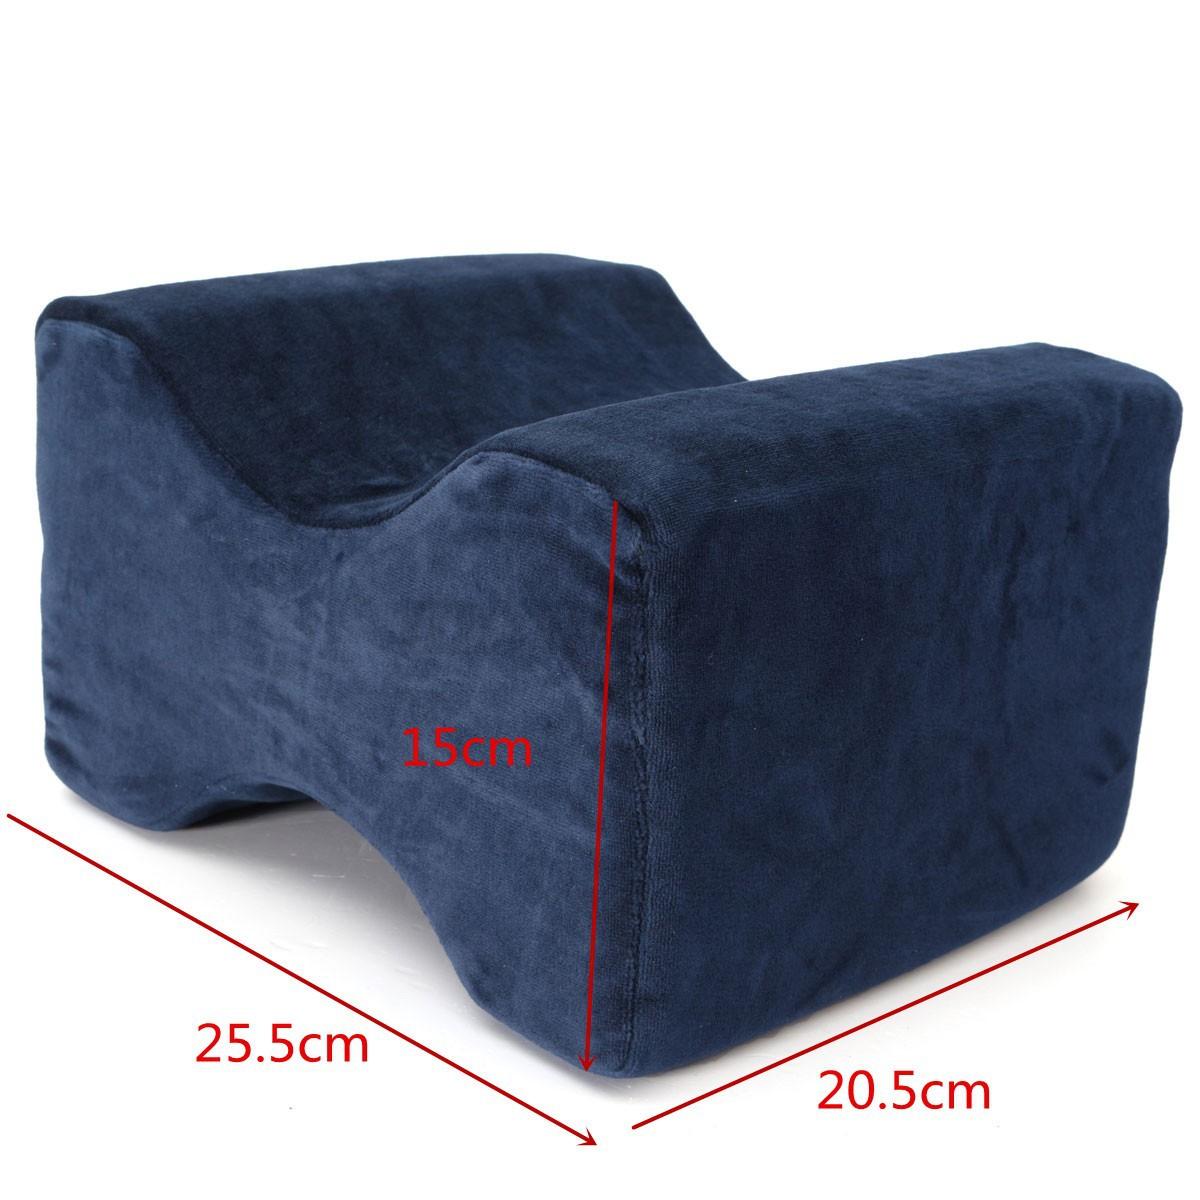 Contour Memory Foam Leg Pillow Orthopaedic Back Knee